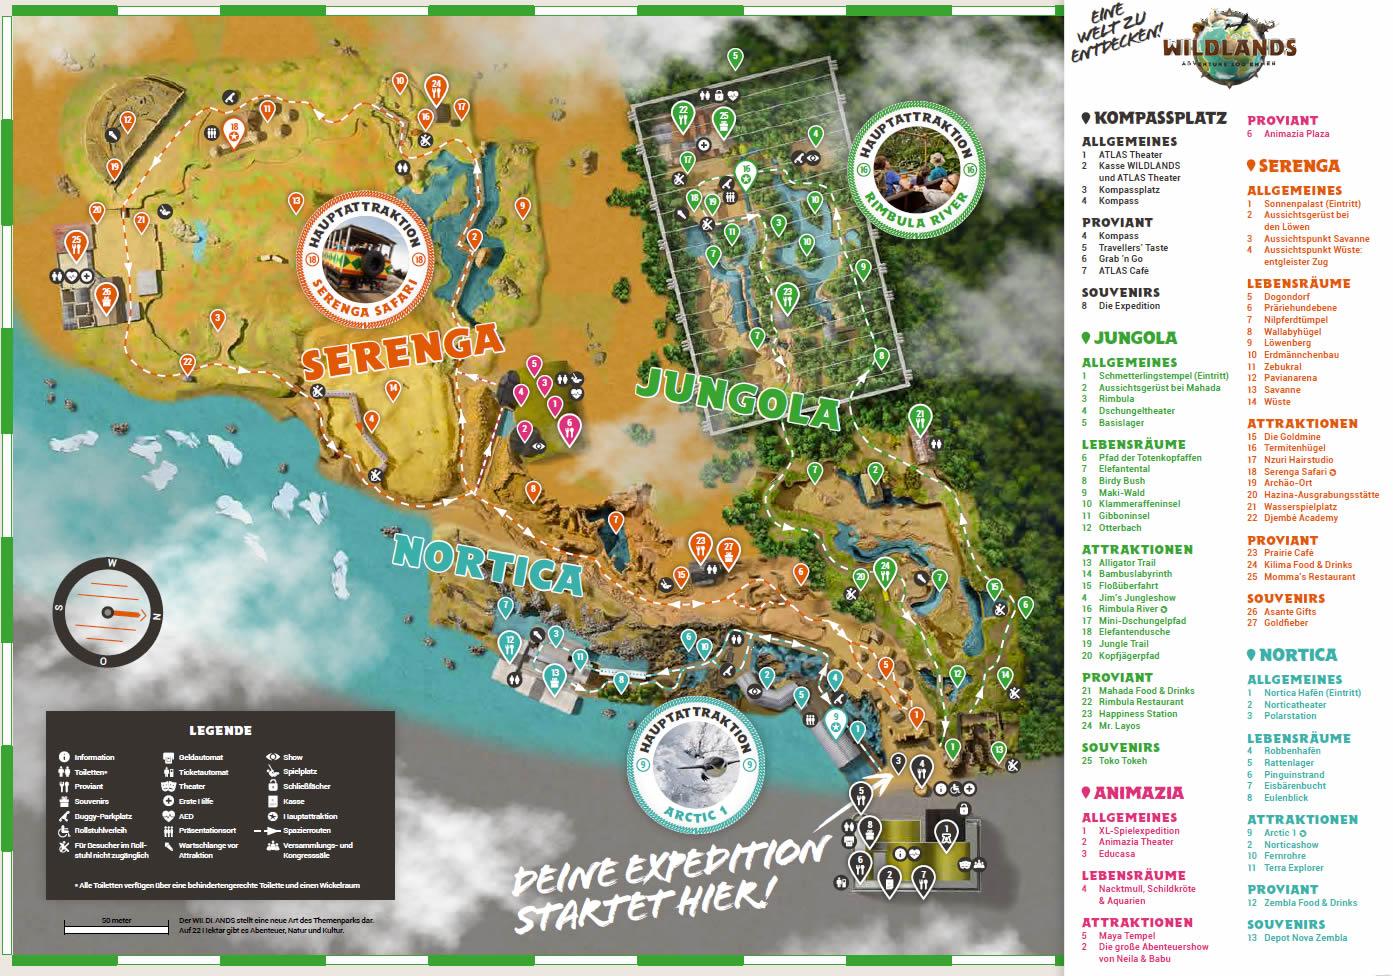 zoo holland karte Parkmaps / Parkplan / Plattegrond   Wildlands Adventure Zoo Emmen